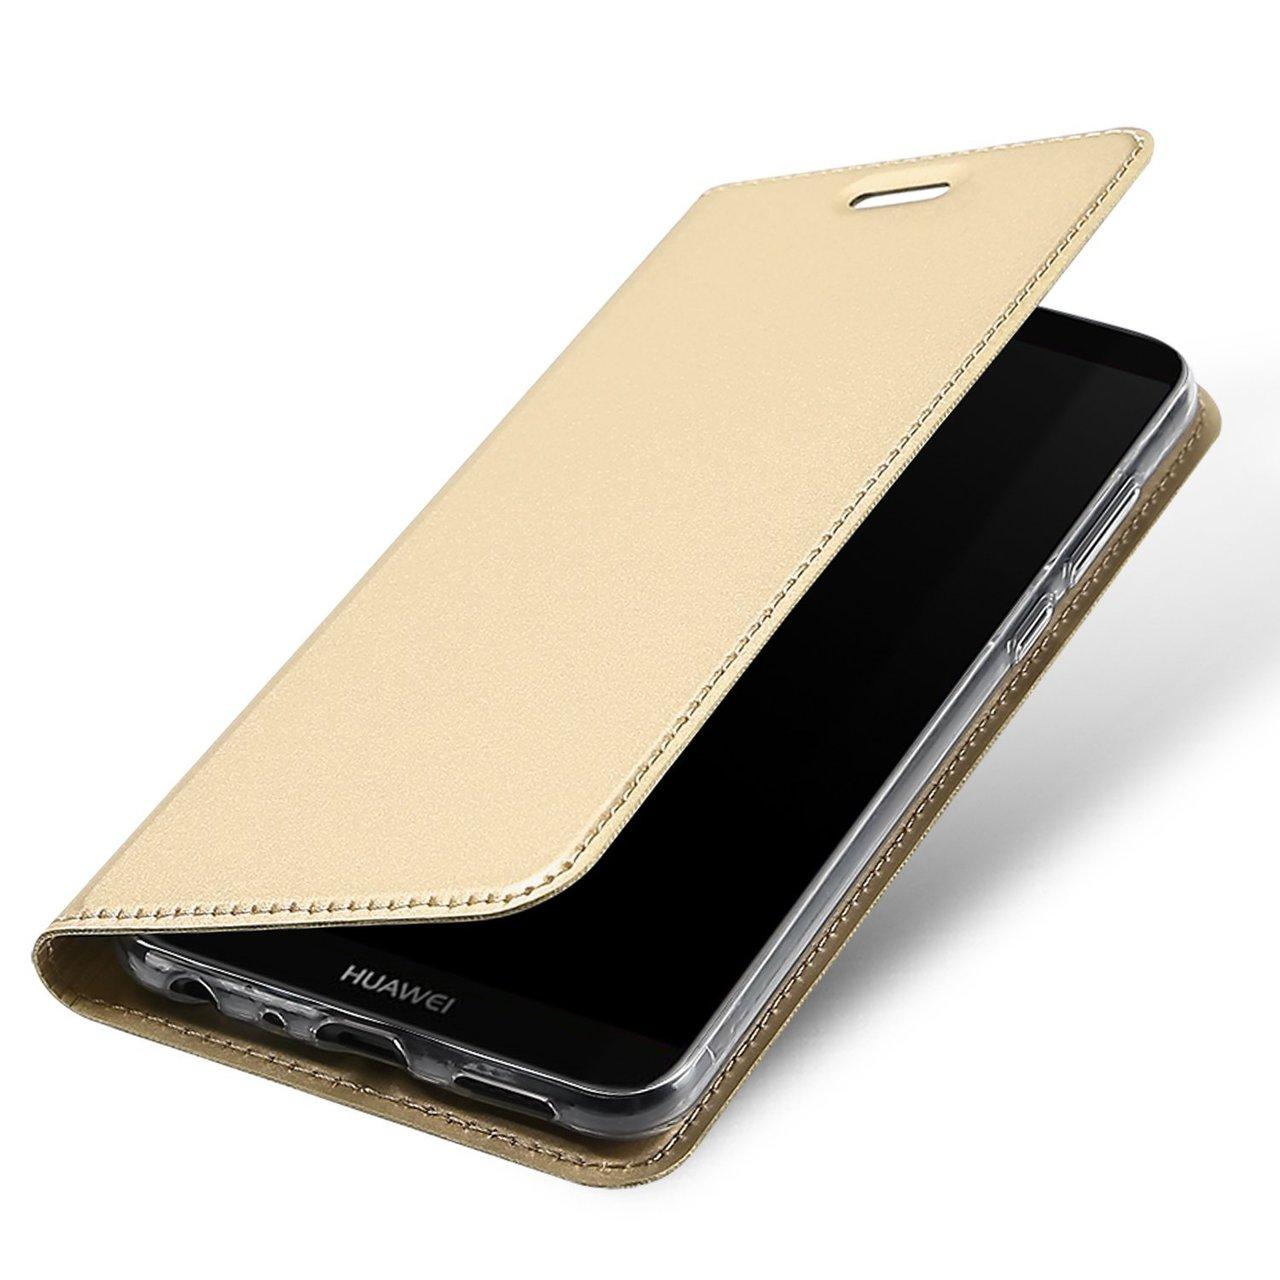 official photos 3098a 0ef23 Huawei P Smart Flip Case